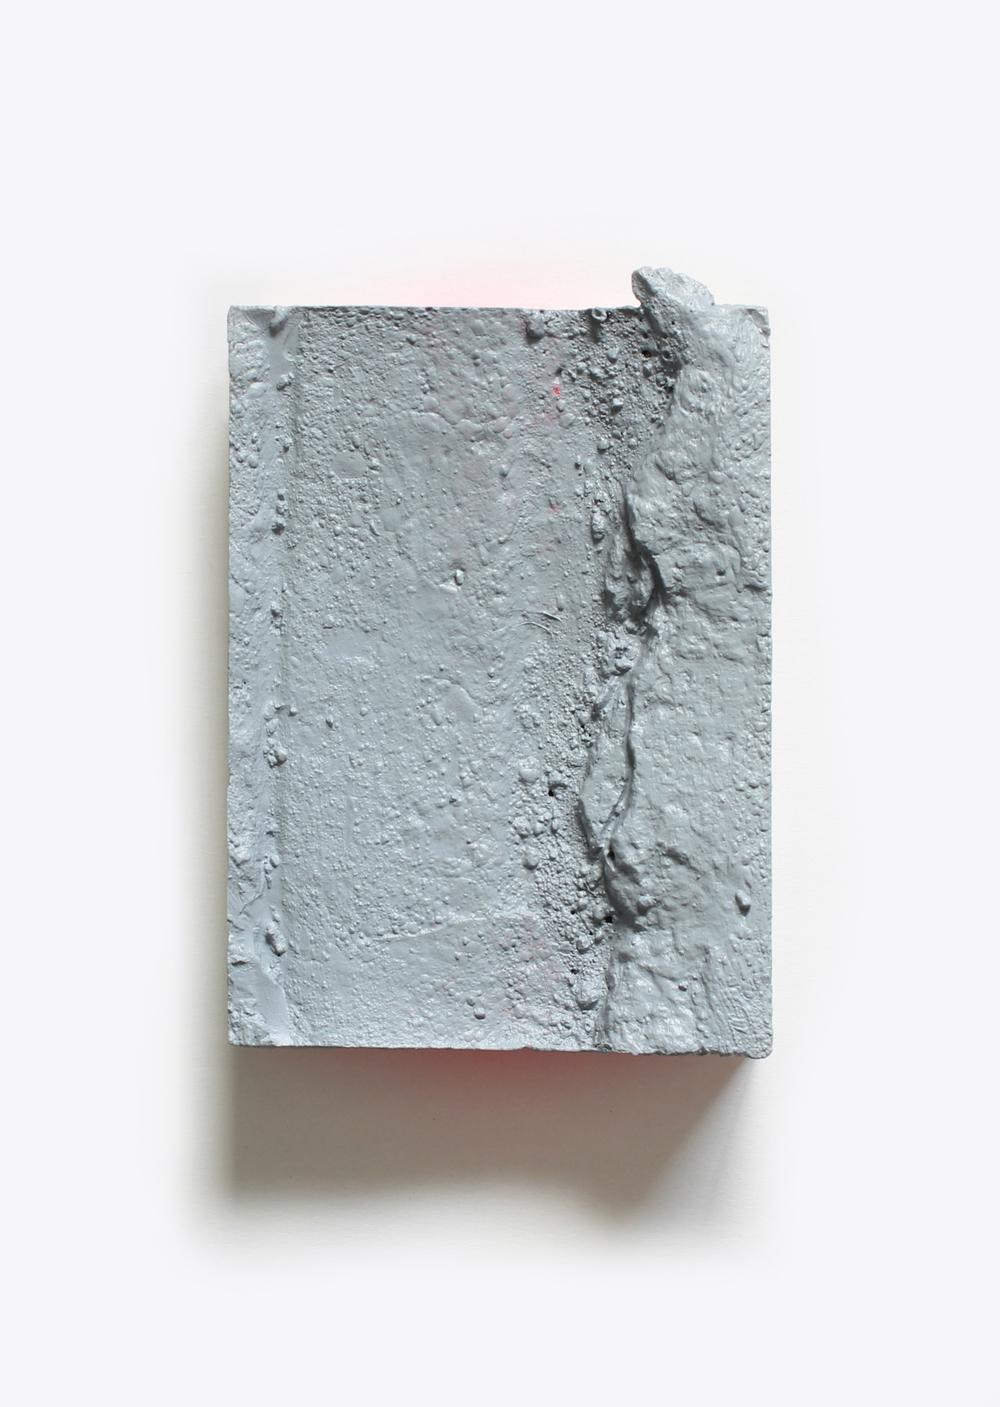 Elise  no. 1  Acrylic and spray paint on plaster  13cm x 18cm